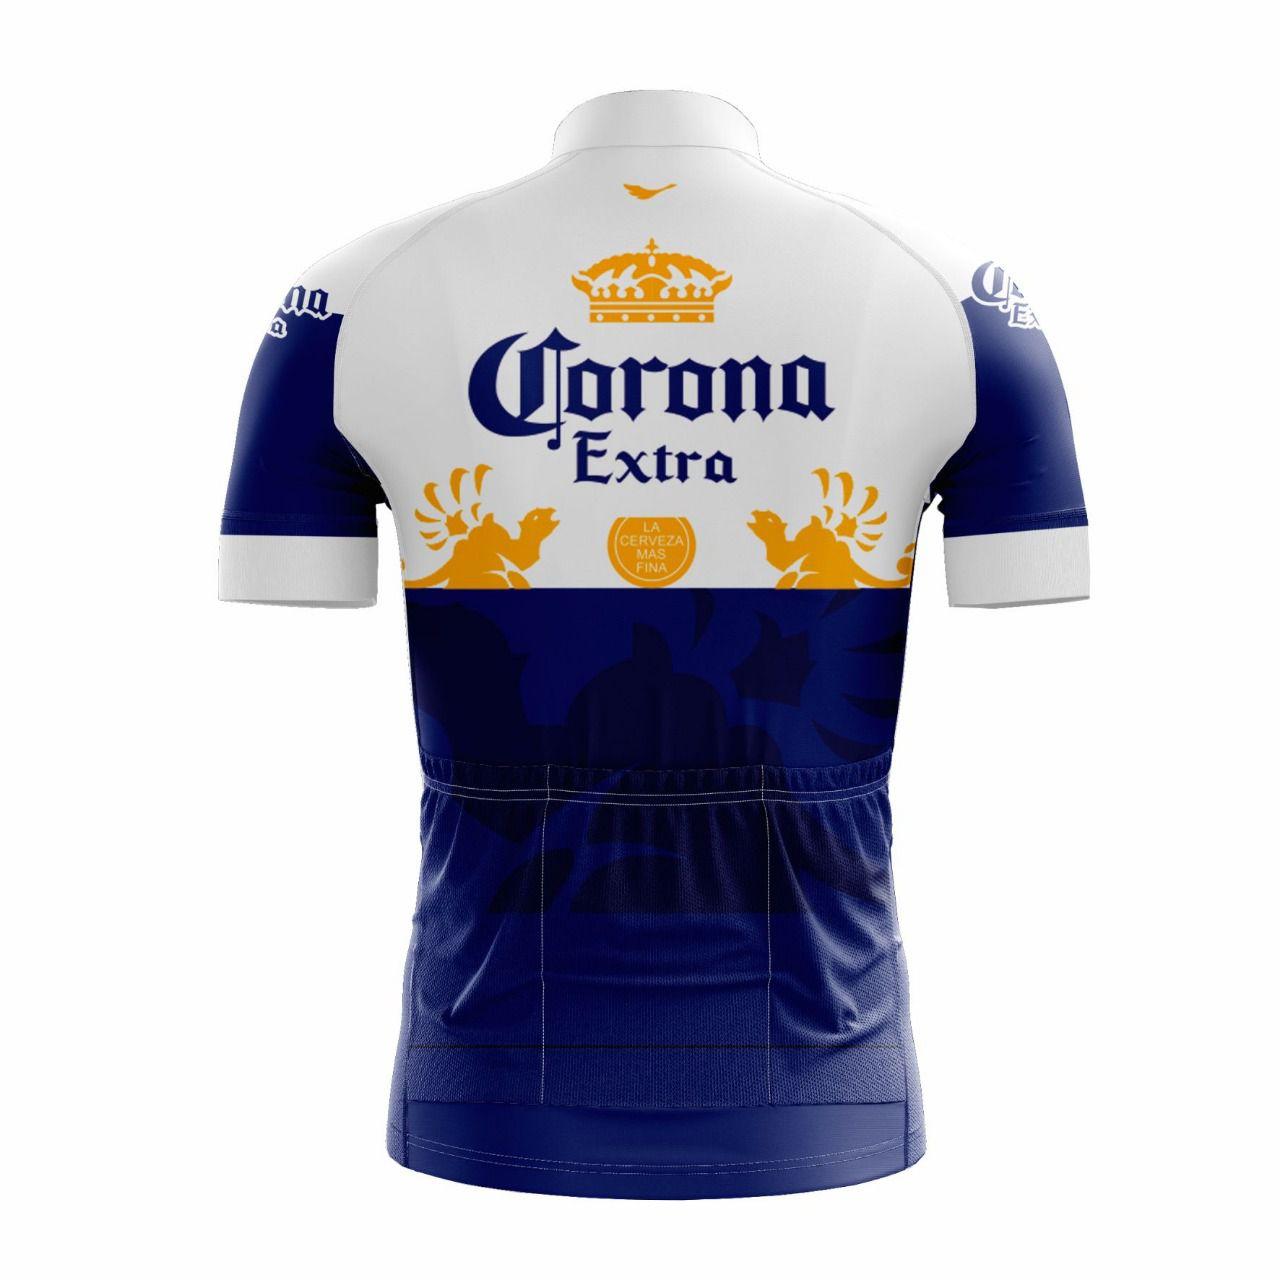 Camisa Ciclismo Cerveja Corona